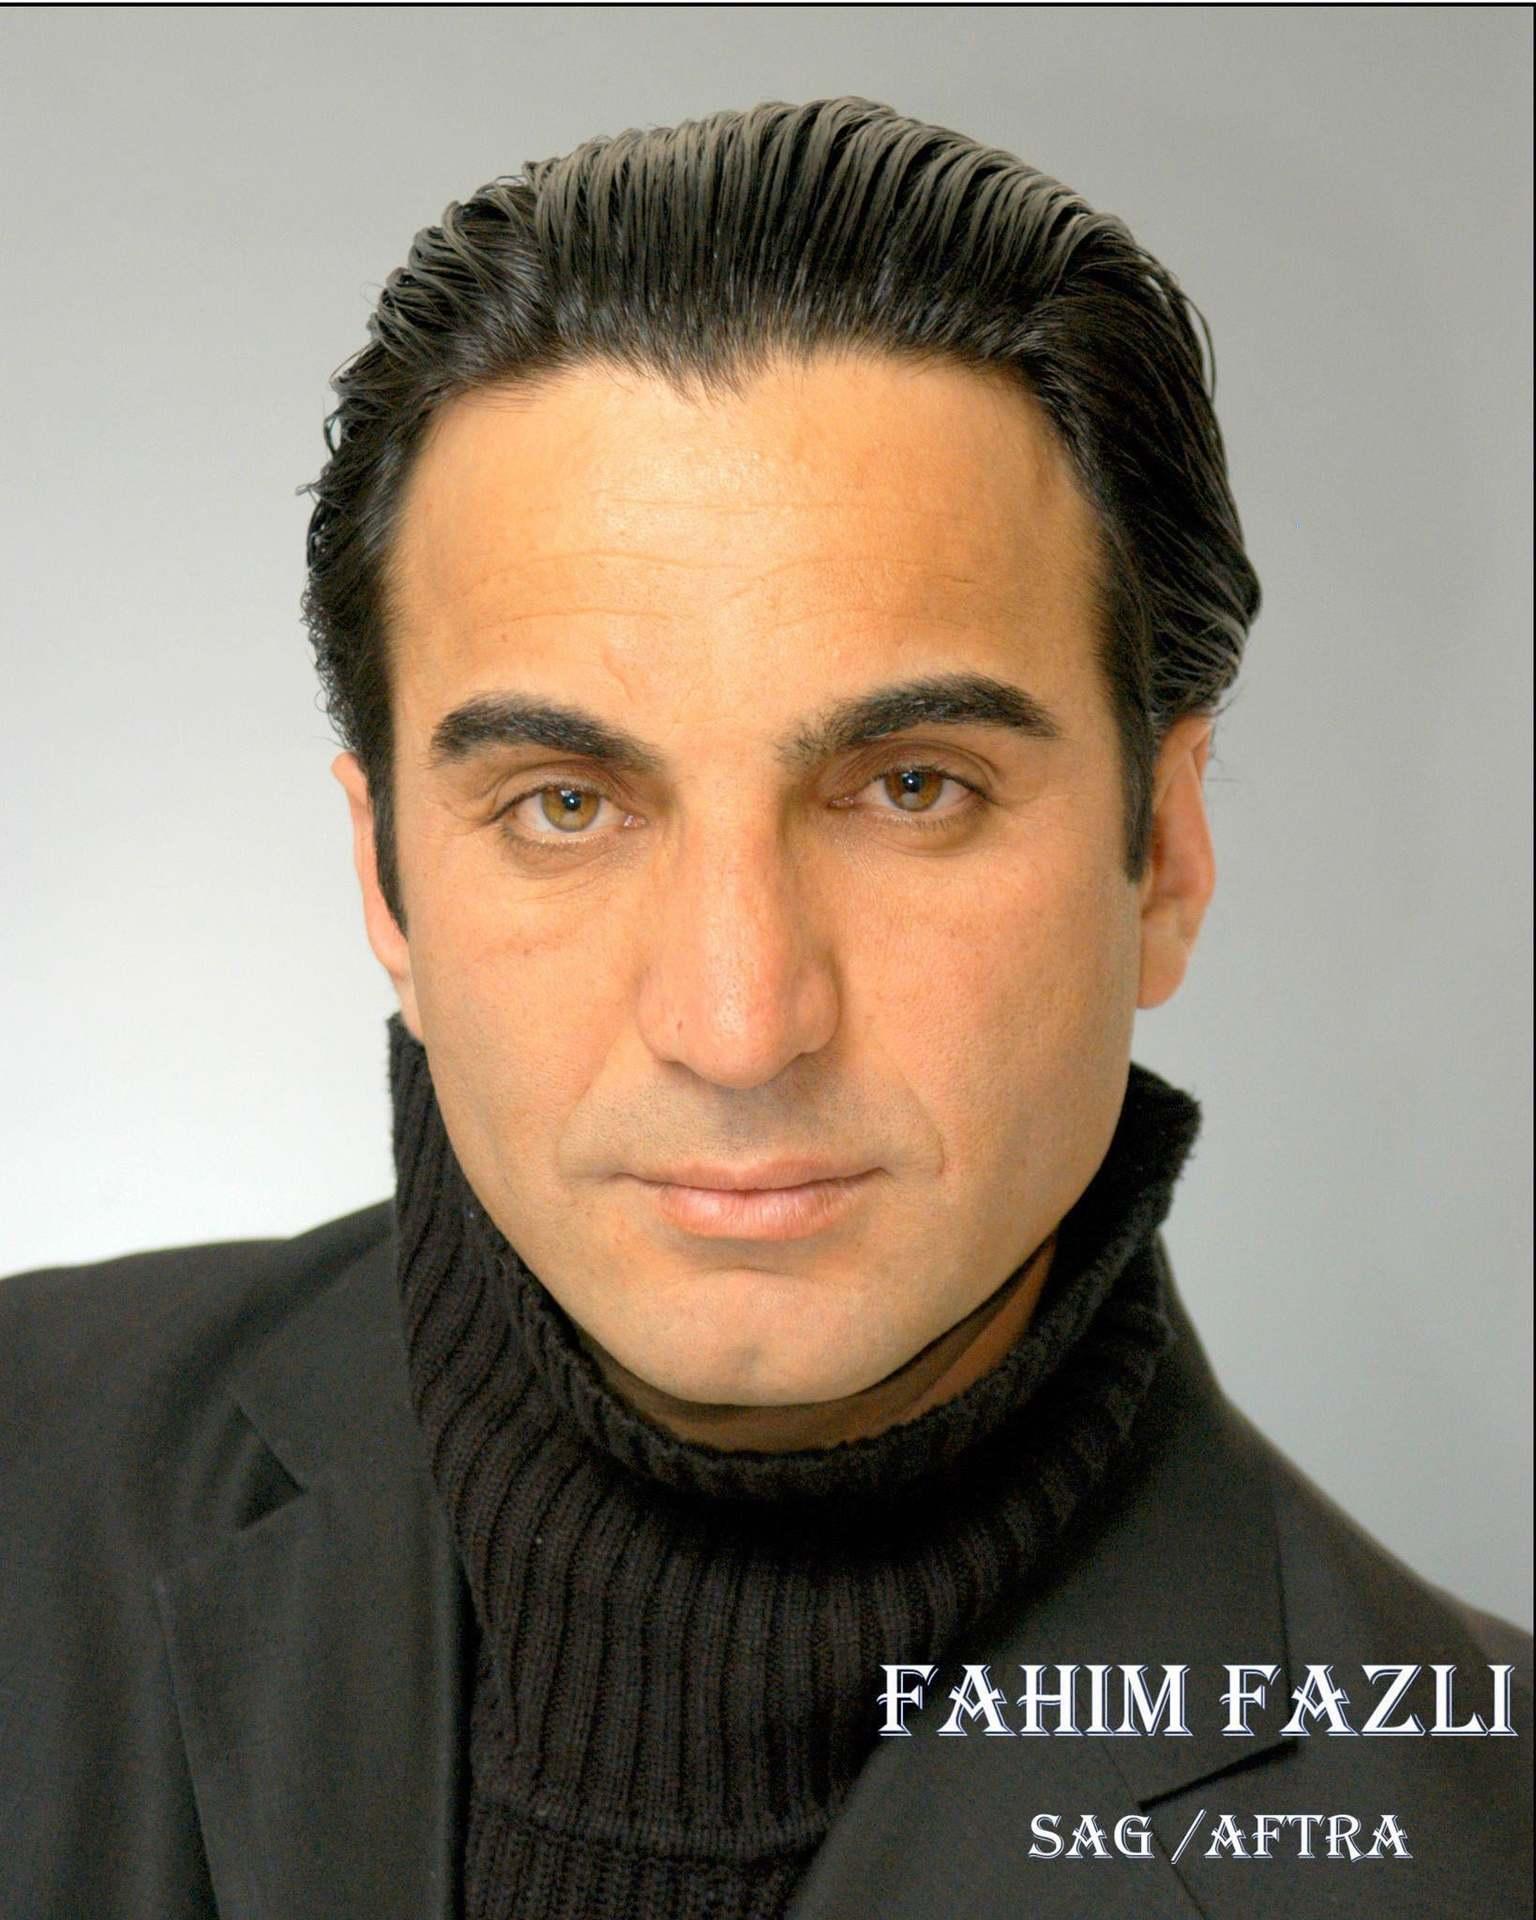 Фото Фахим Фазли